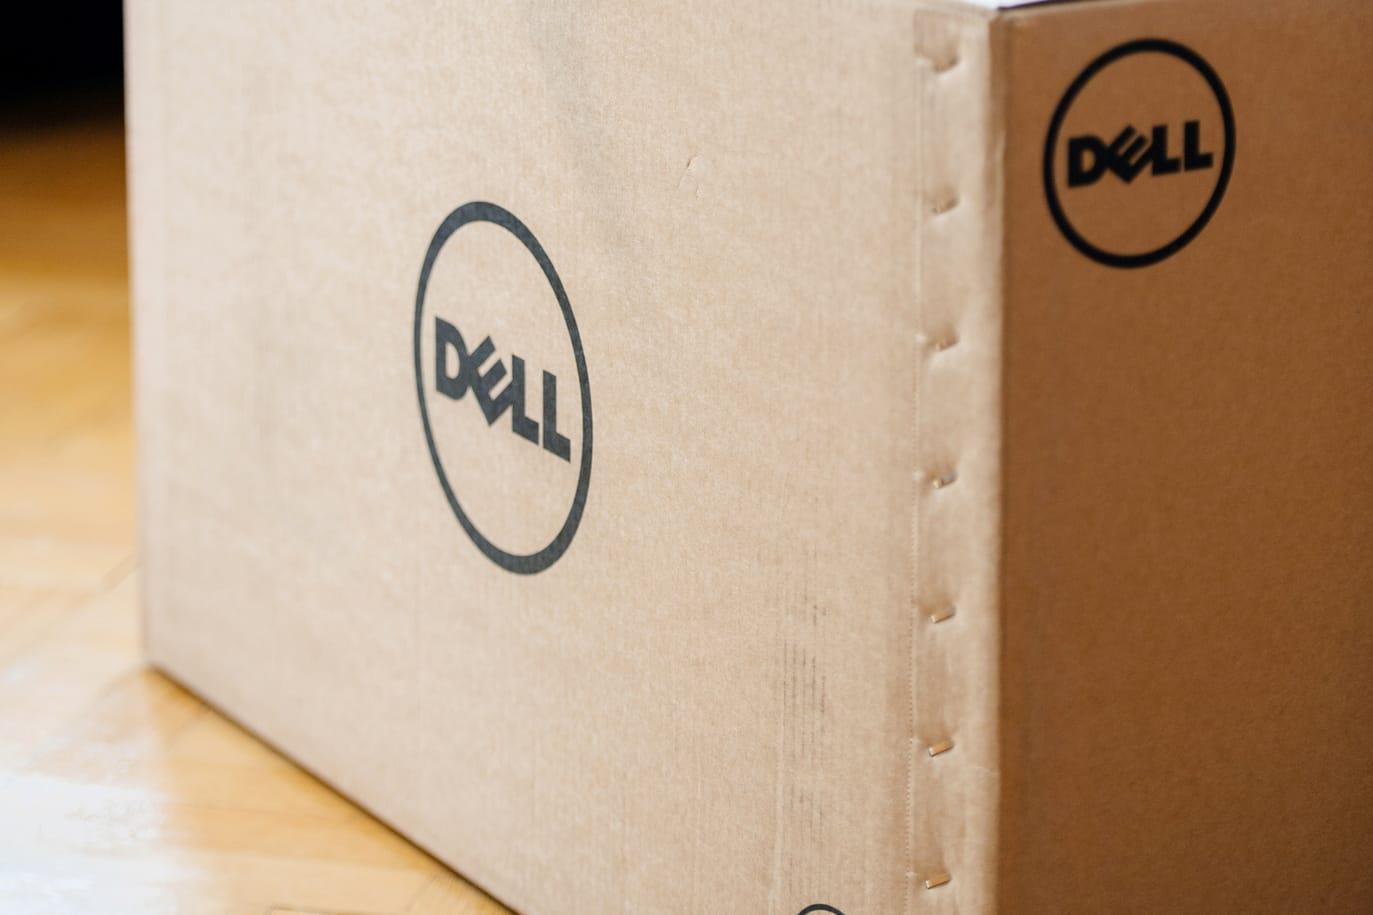 Dell cardboard box